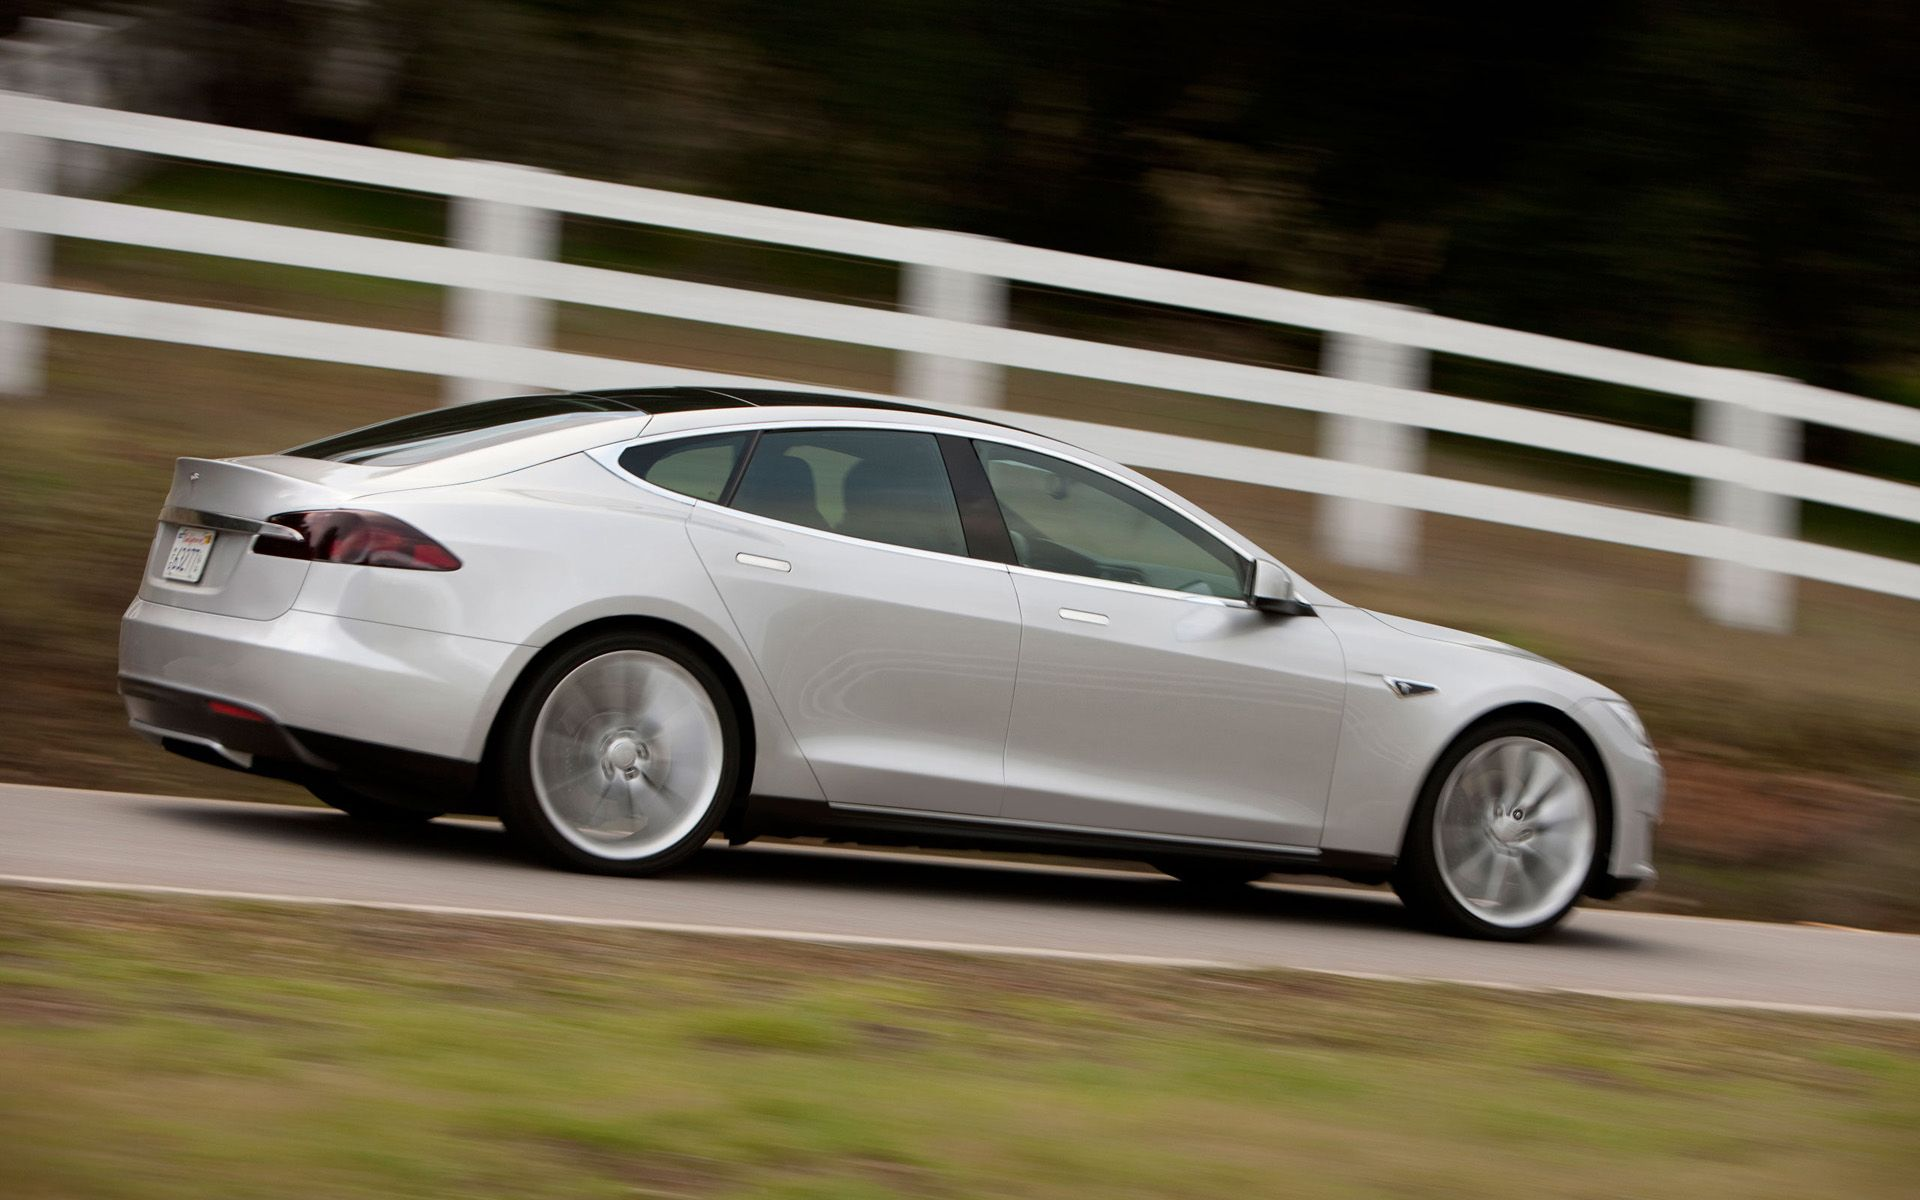 Alpha Model S Driving Tesla Motors Live HD Wallpapers - All models of tesla